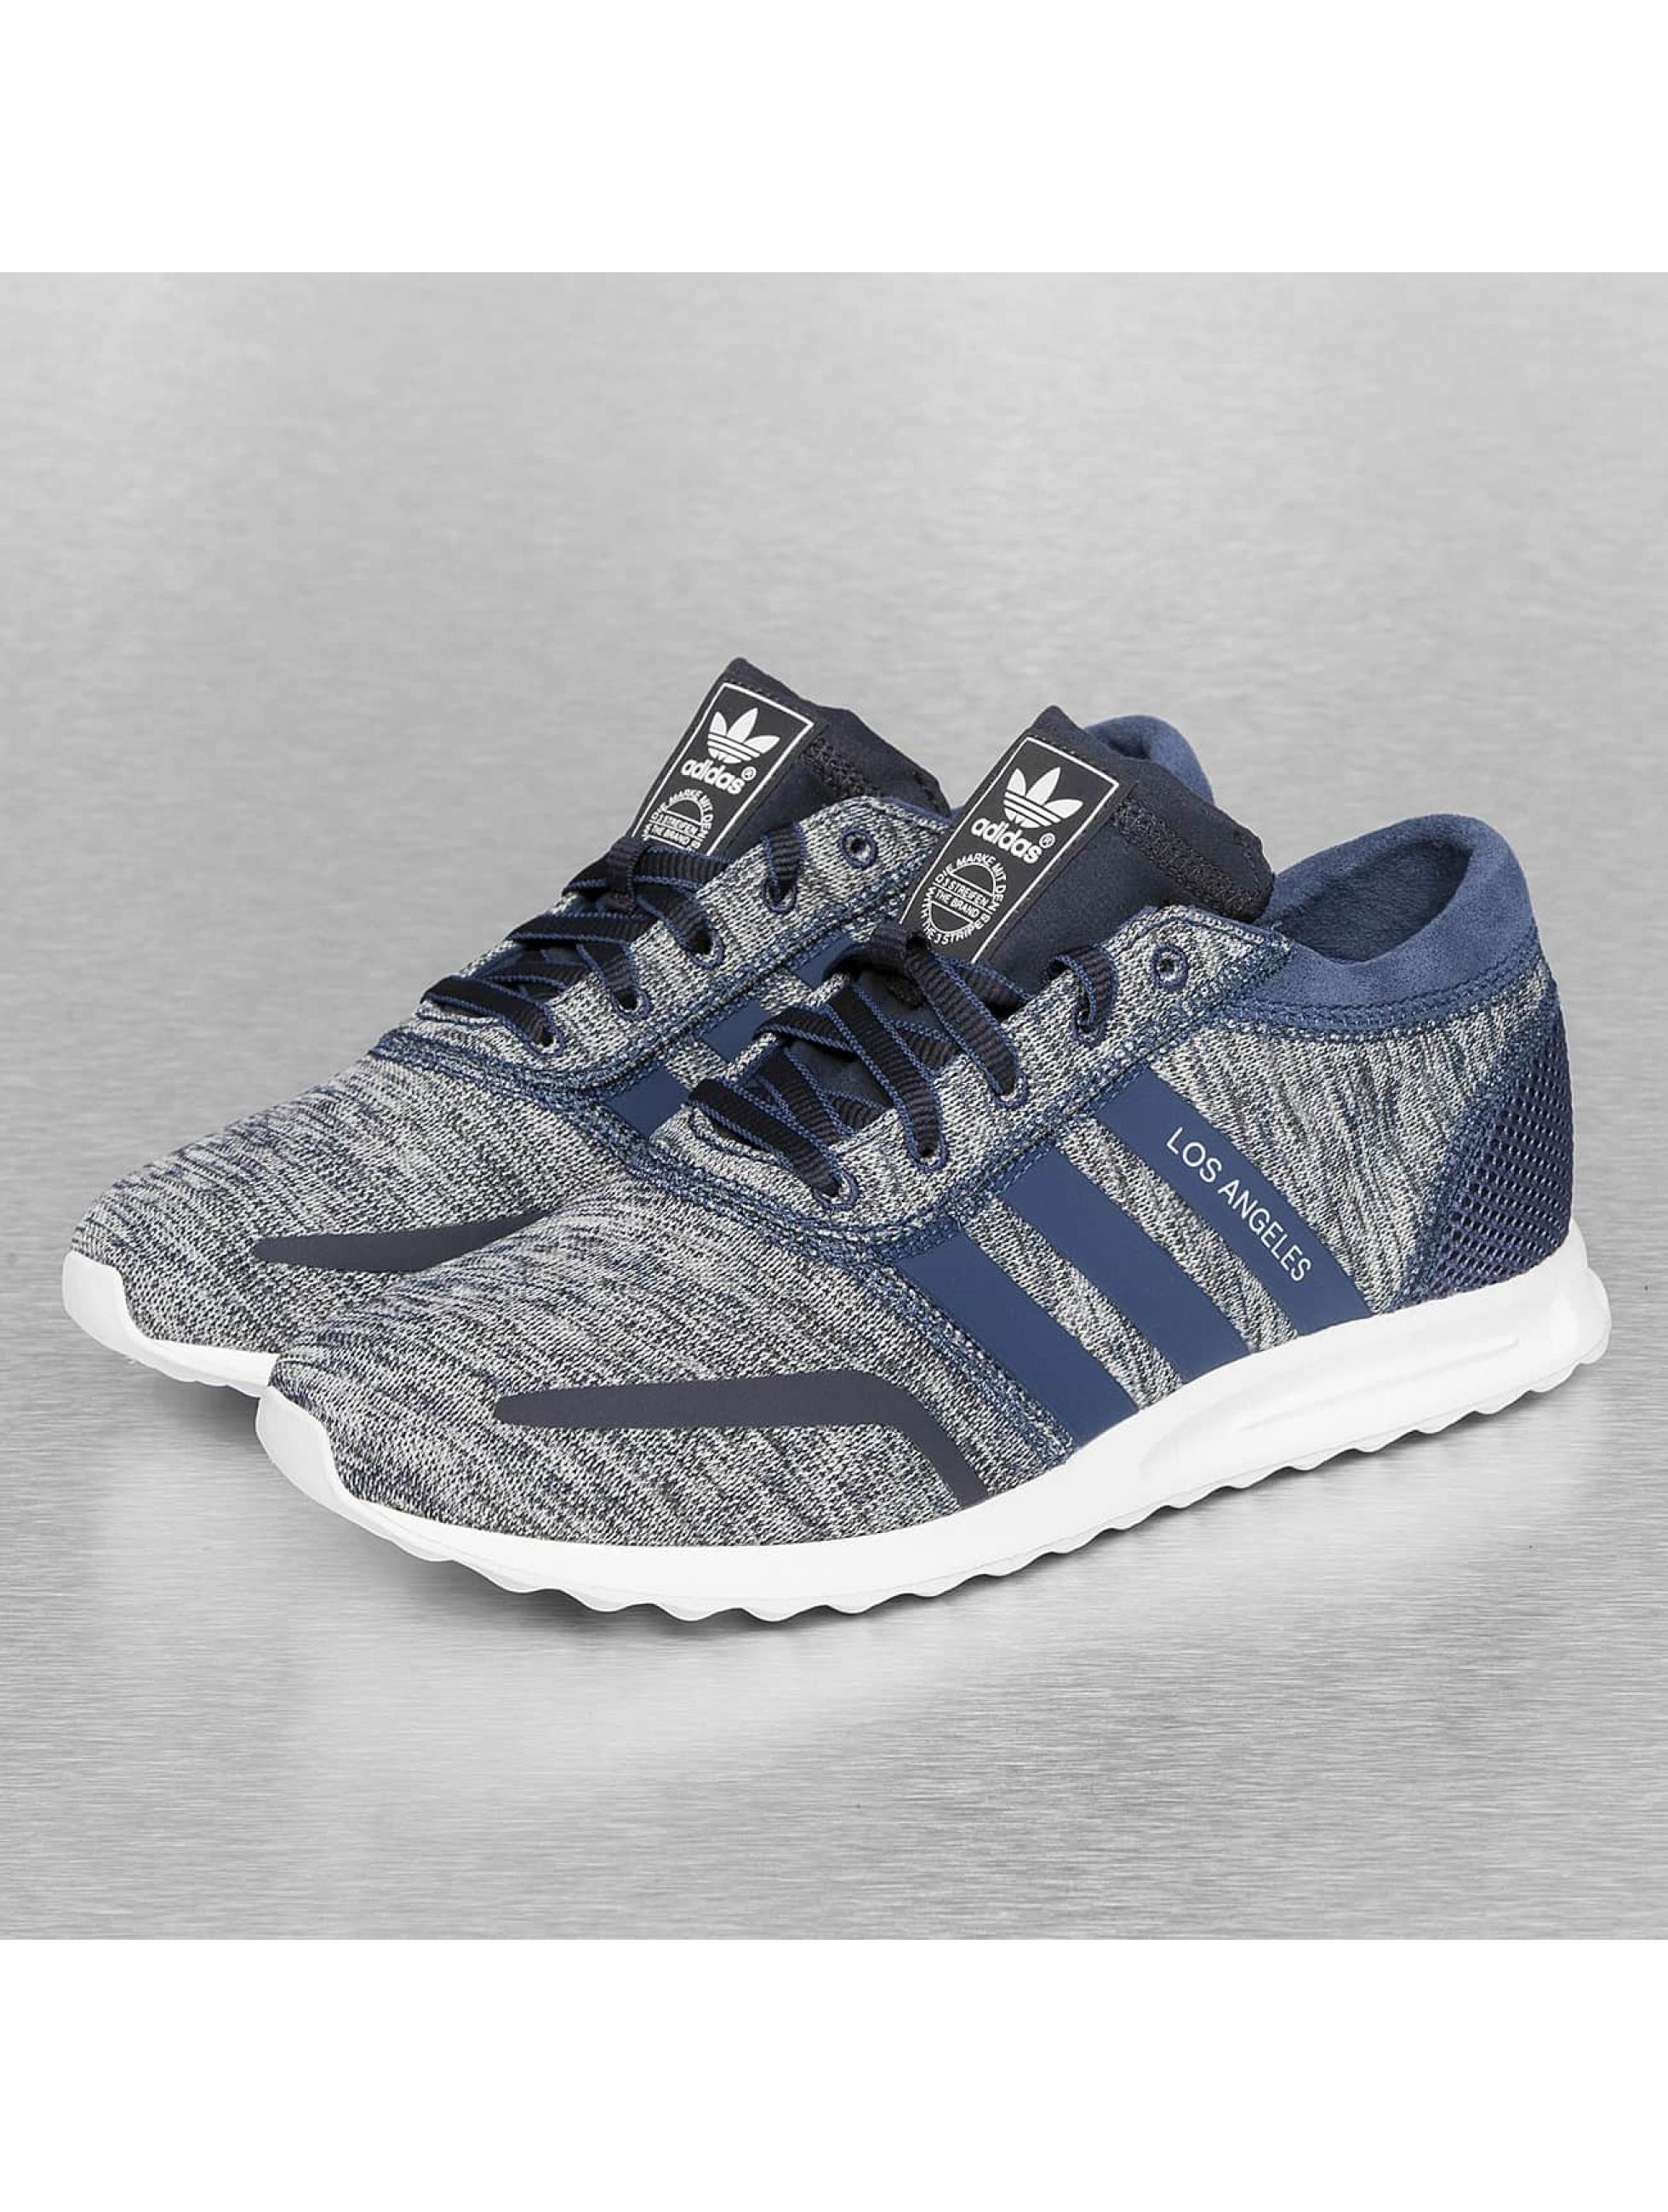 Adidas Los Angeles Blau Rosa